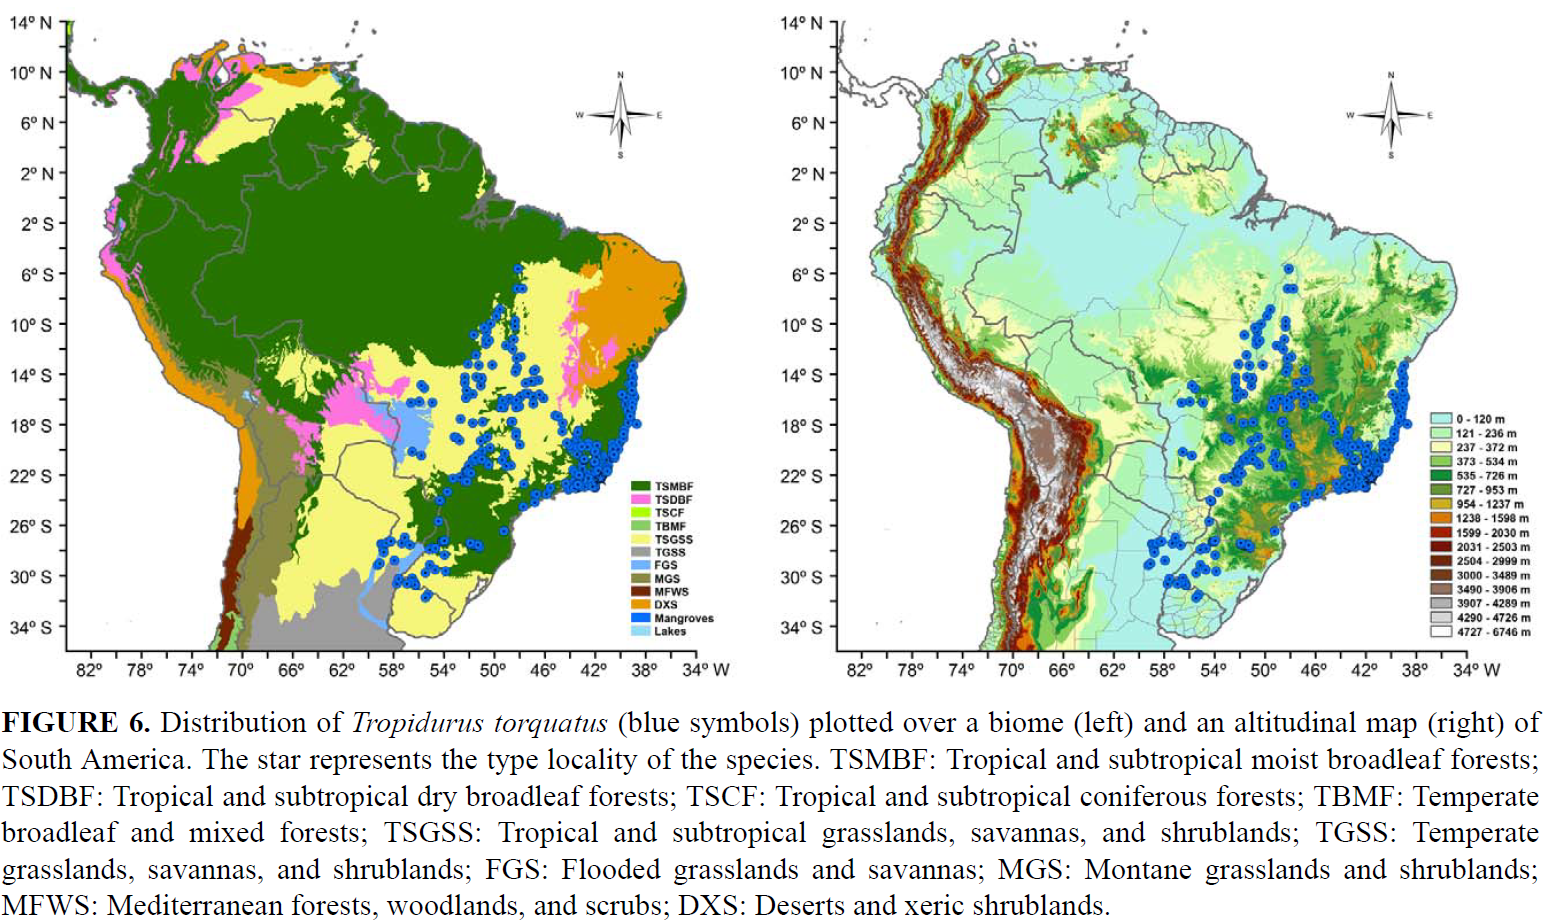 Distribution map presented in Gomes de Carvalho (2013)